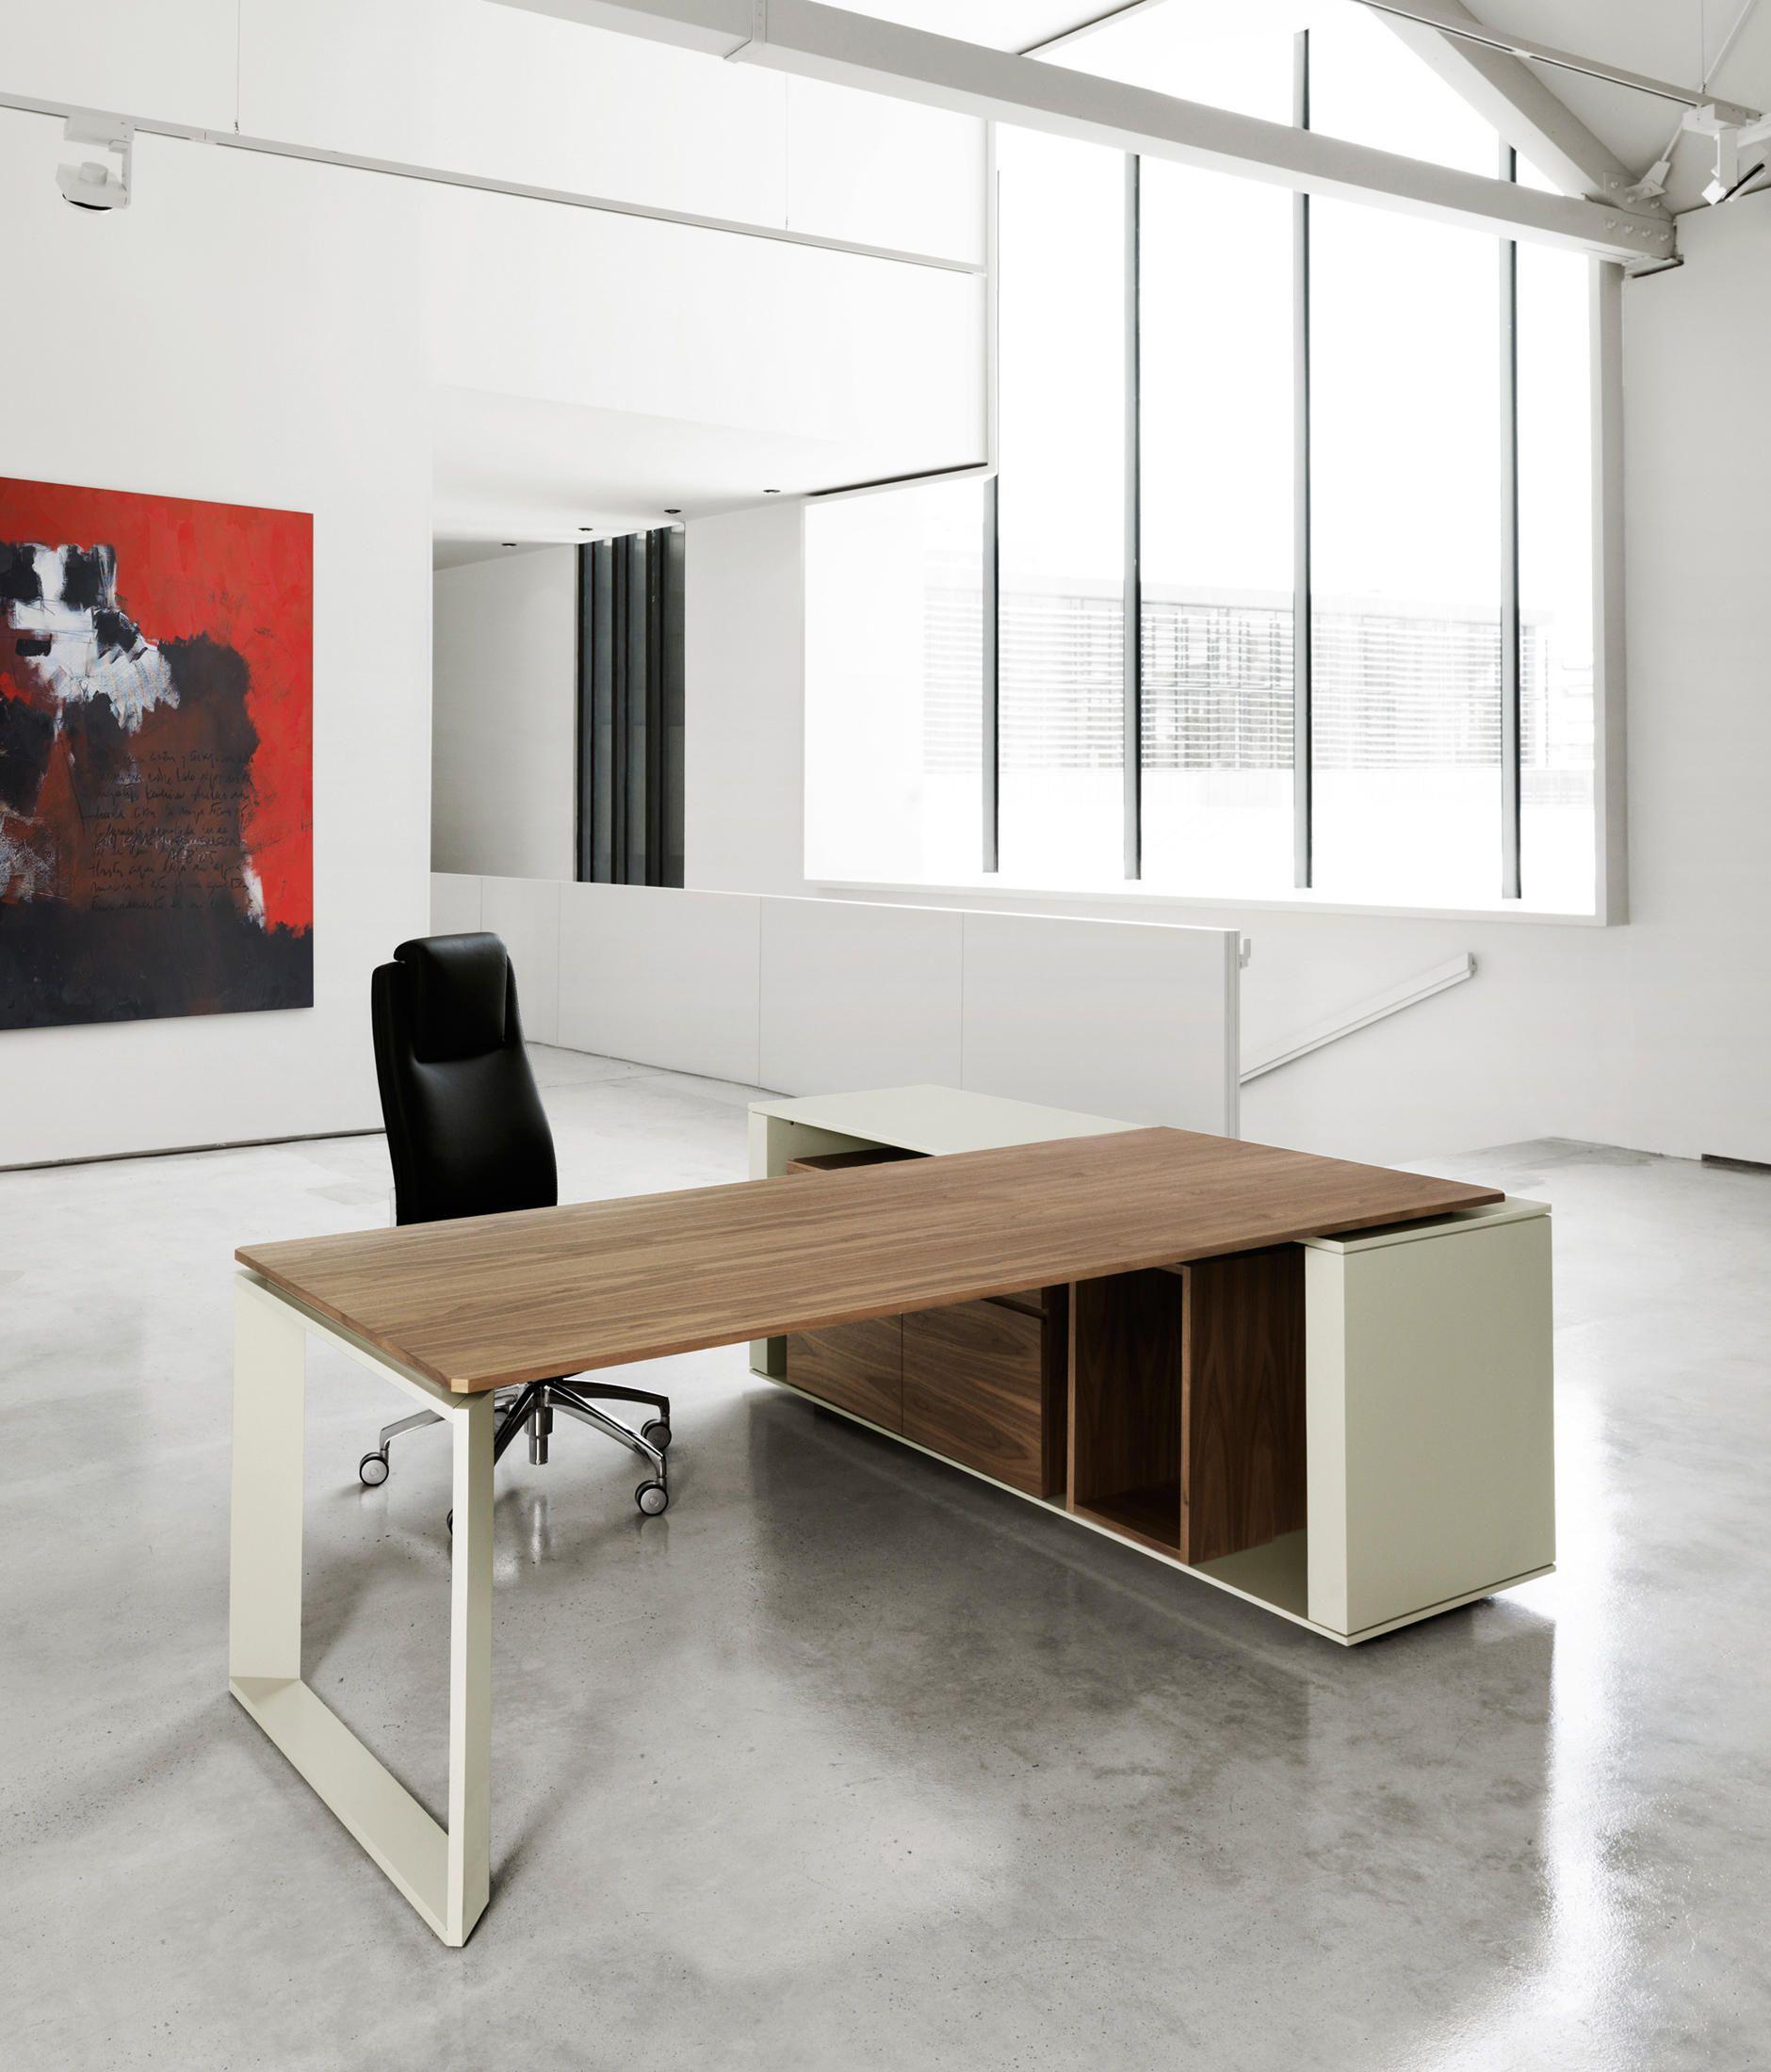 Designer Desks From AG Land All